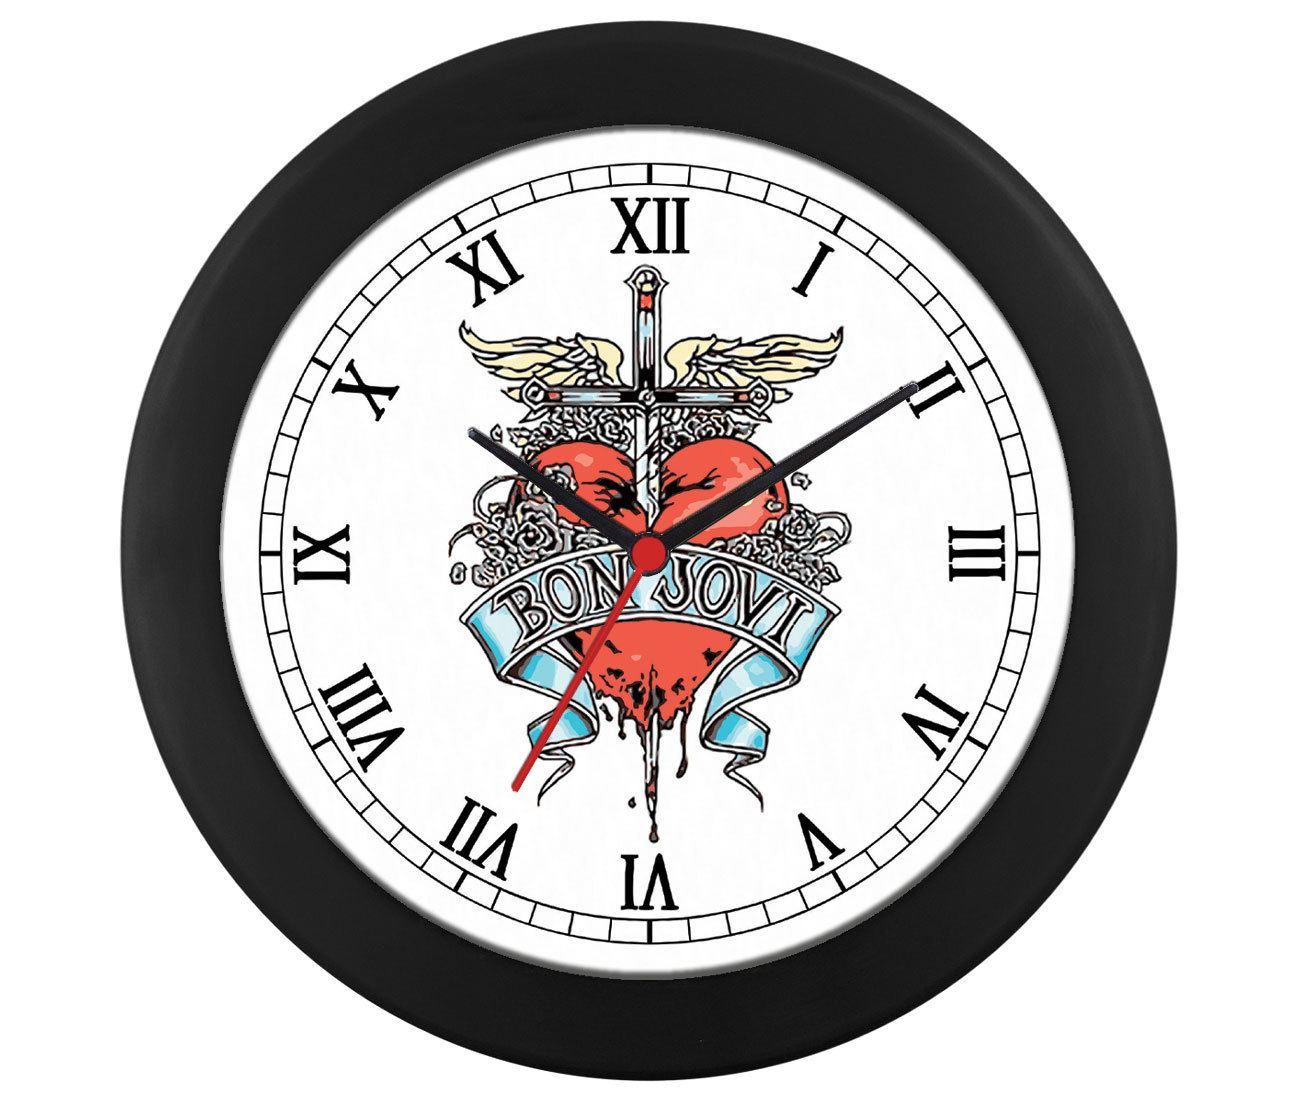 Relógio de parede Bon Jovi